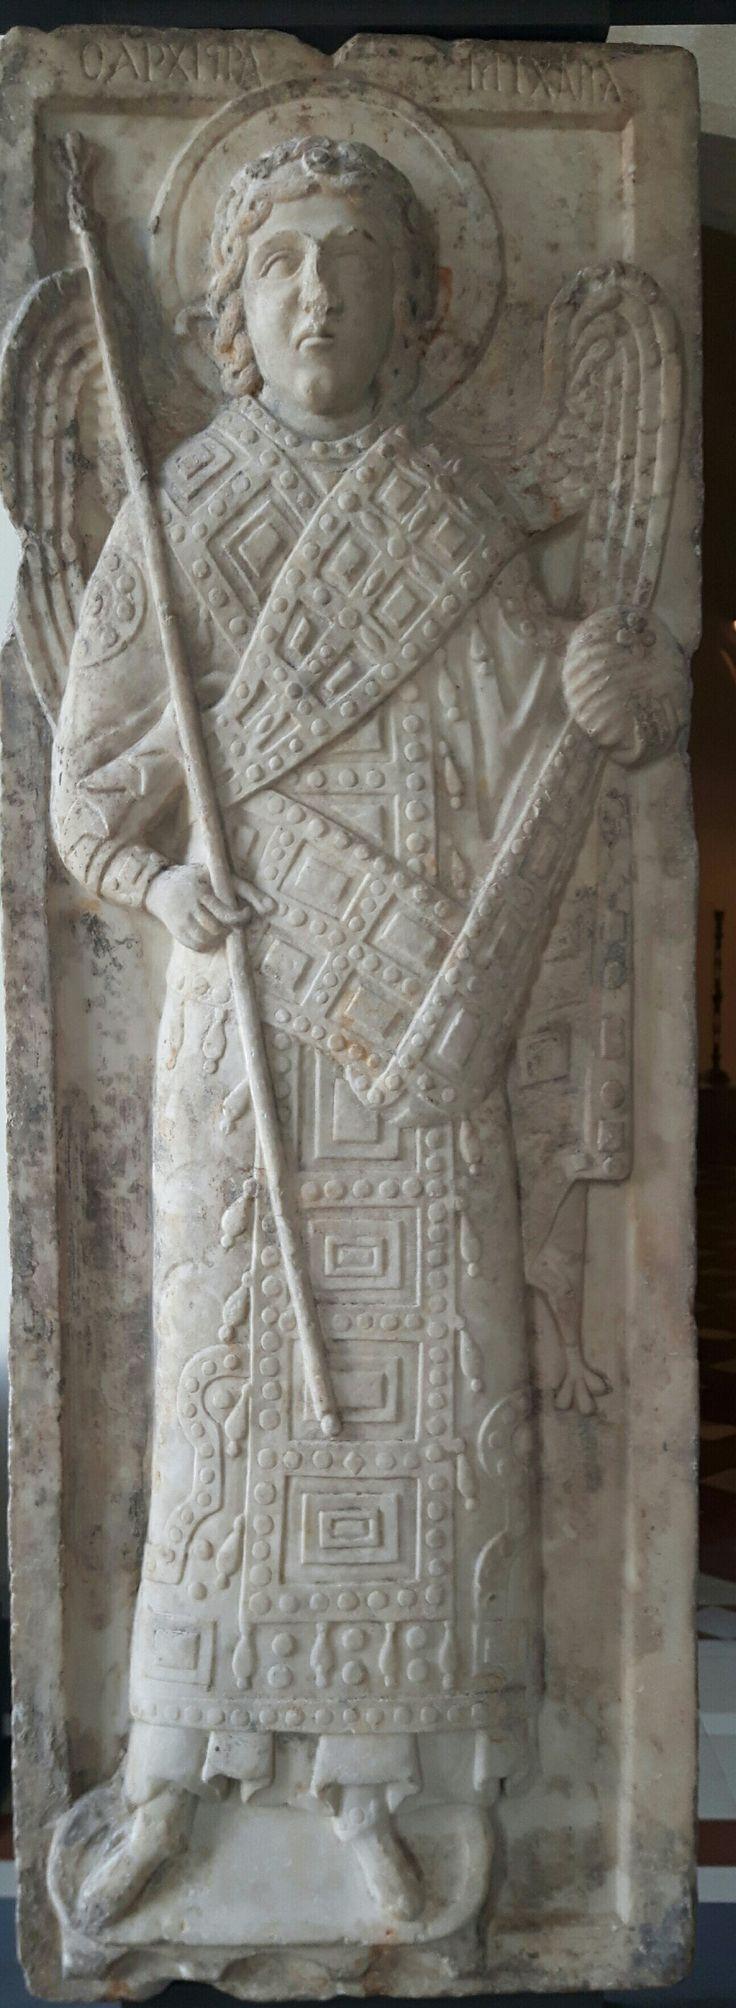 Icona con l'Arcangelo Michele.  1275. Bode Museum Berlino